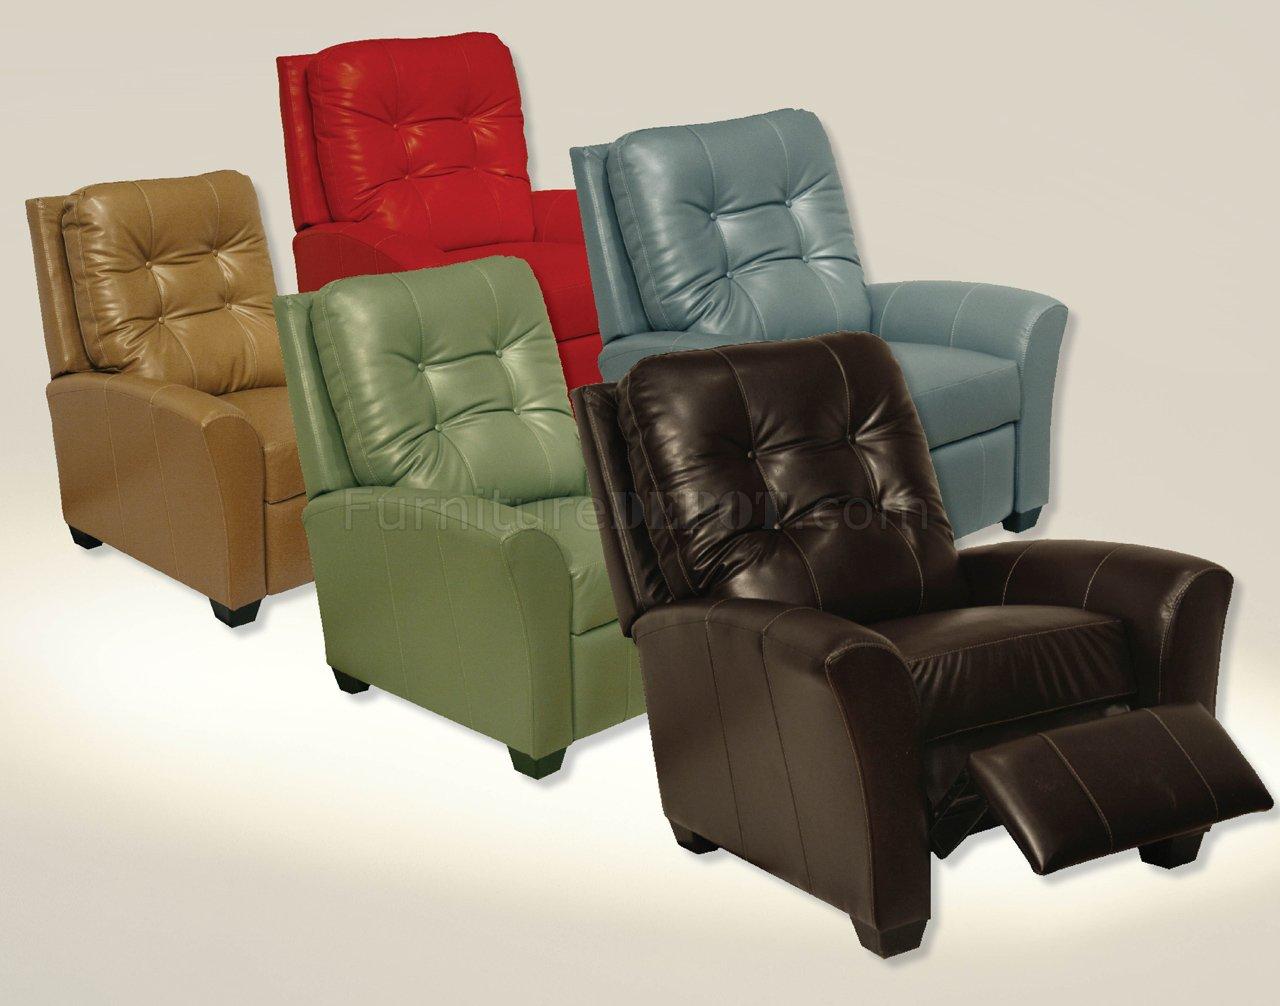 Choice of Color Modern Braxton Reclining Chair CNR 5529 Braxton